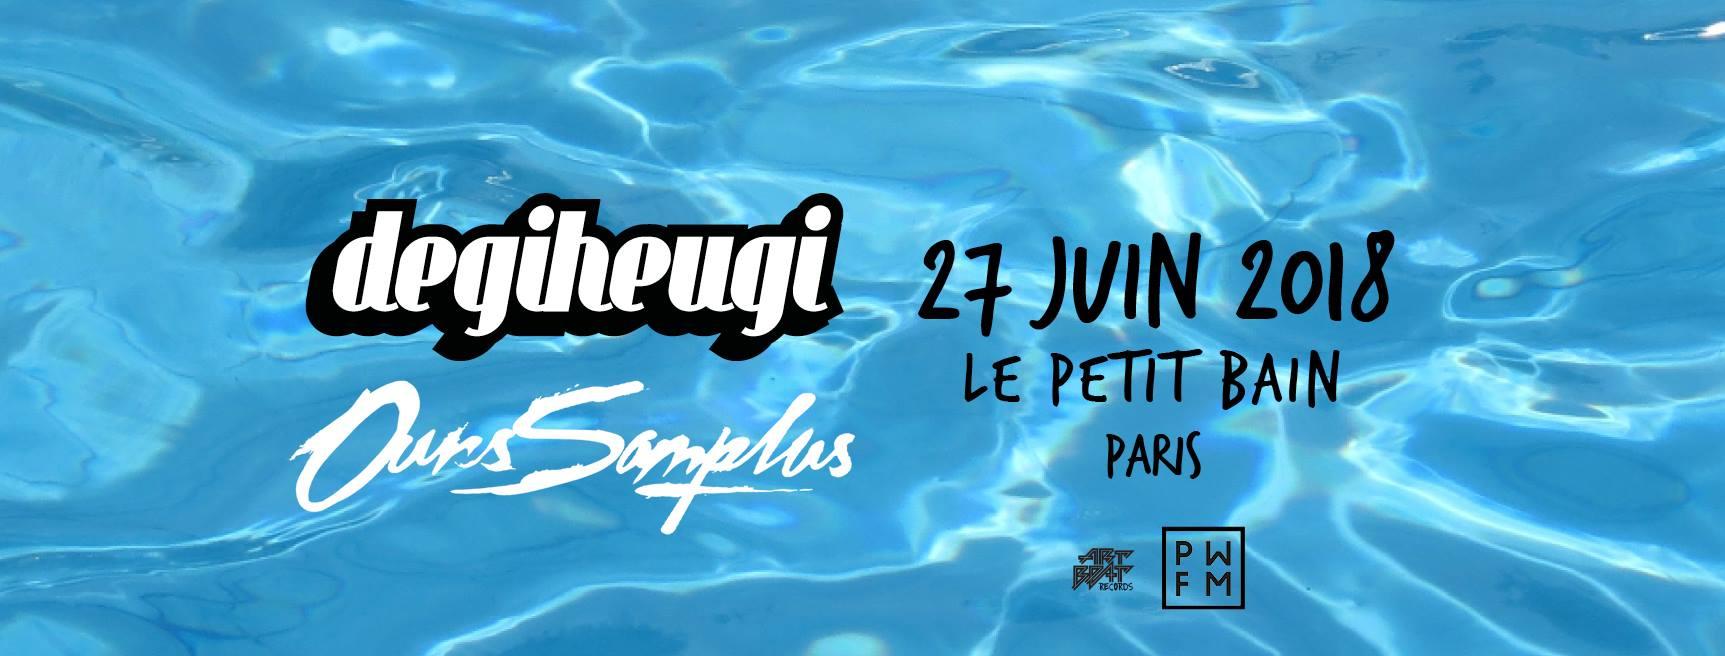 Degiheugi & Ours Samplus – Petit Bain (Paris) – 27 Juin 2018